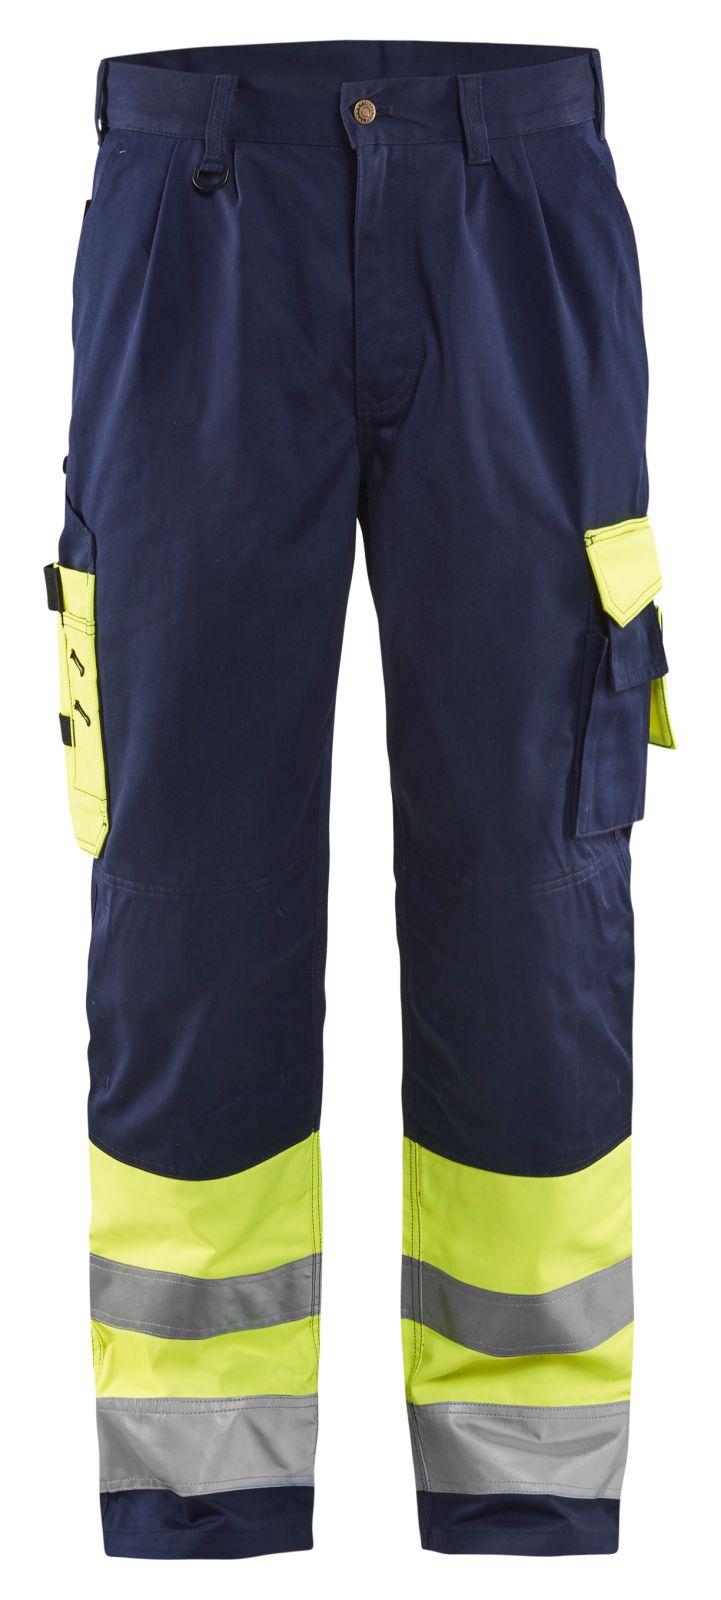 Blaklader Werkbroeken 15841860 High Vis geel-marineblauw(3389)